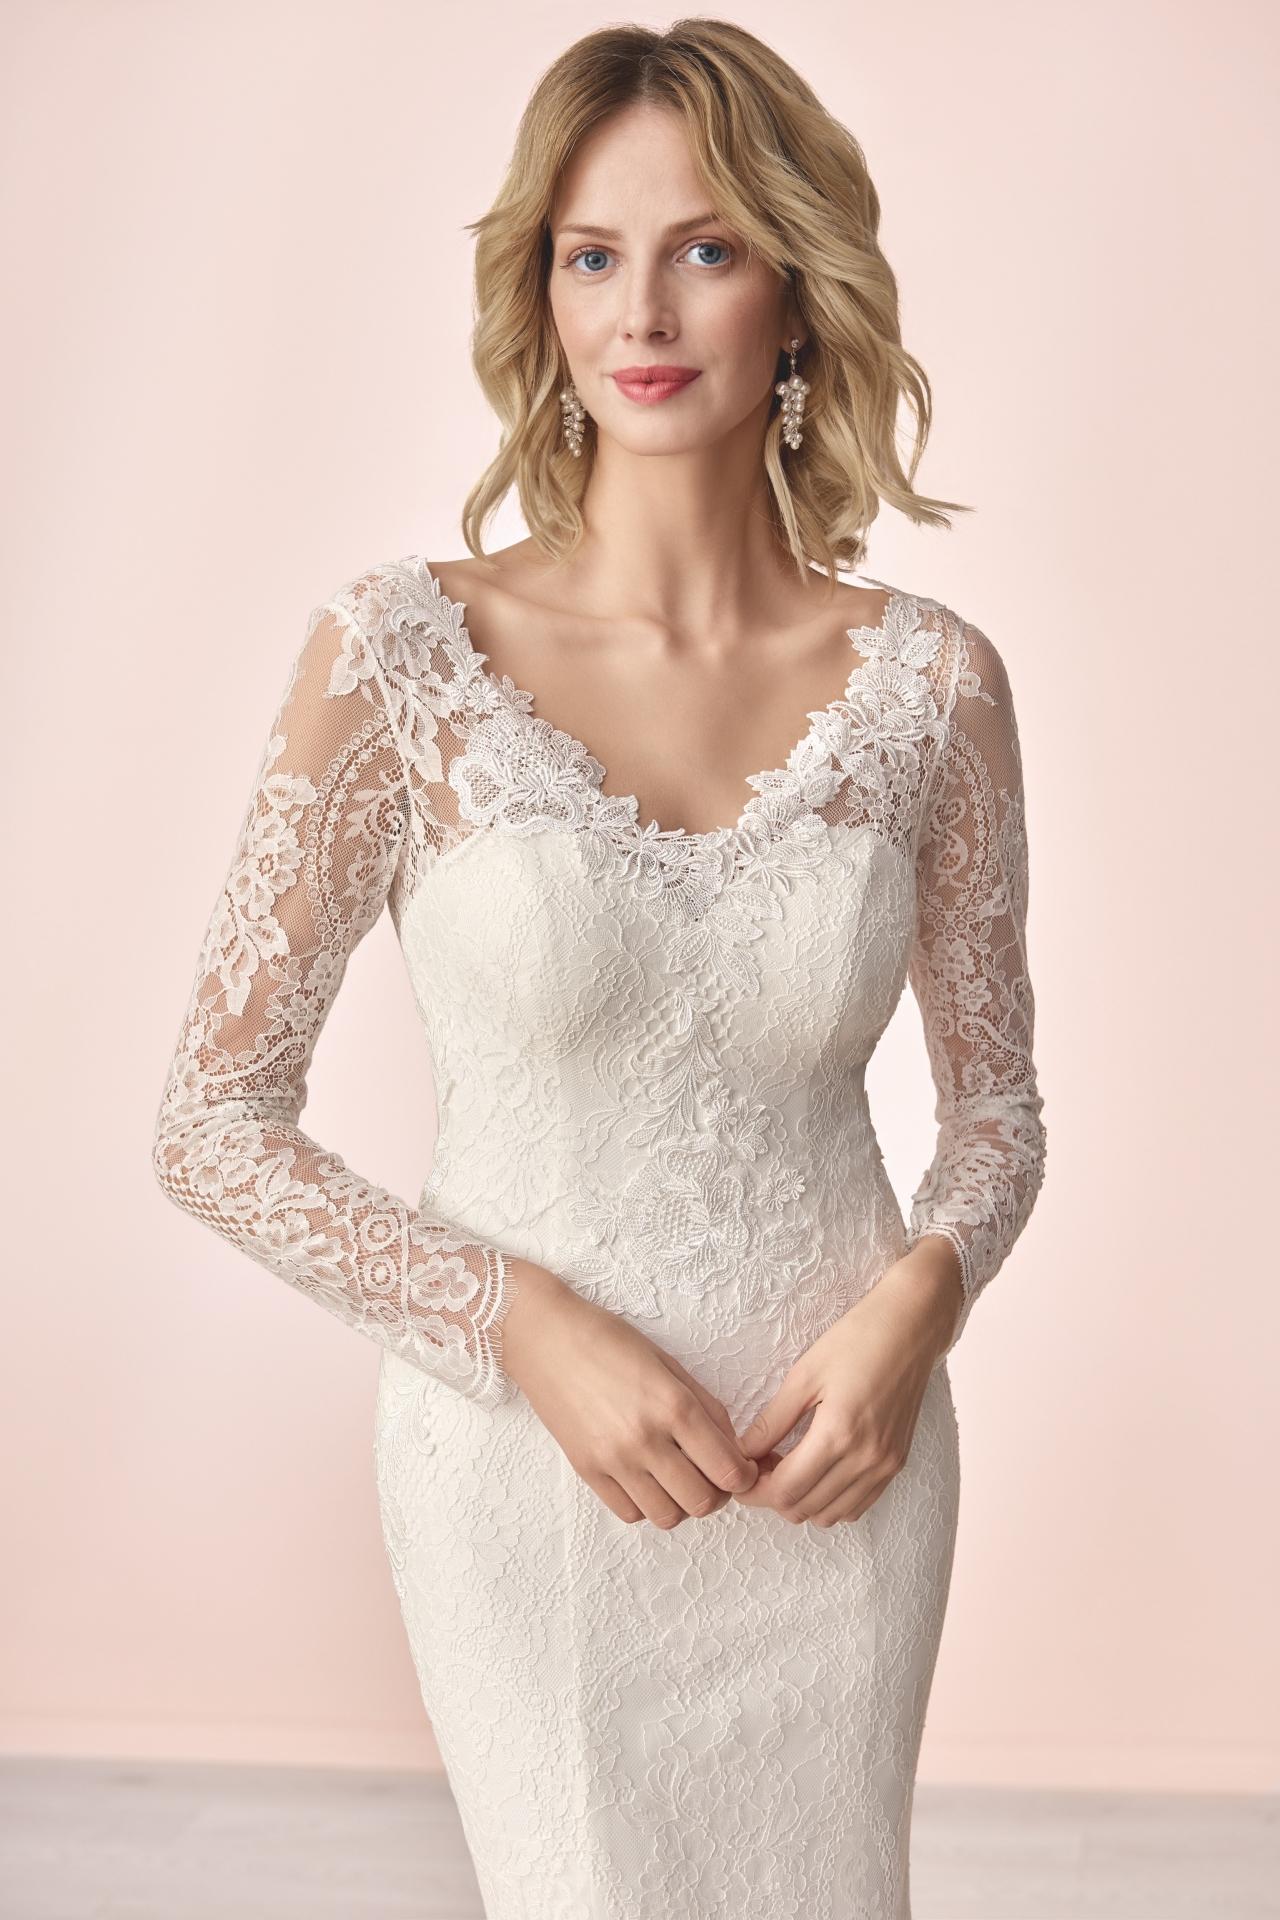 Brautkleid Elizabeth Konin 2019 - 4181T-0